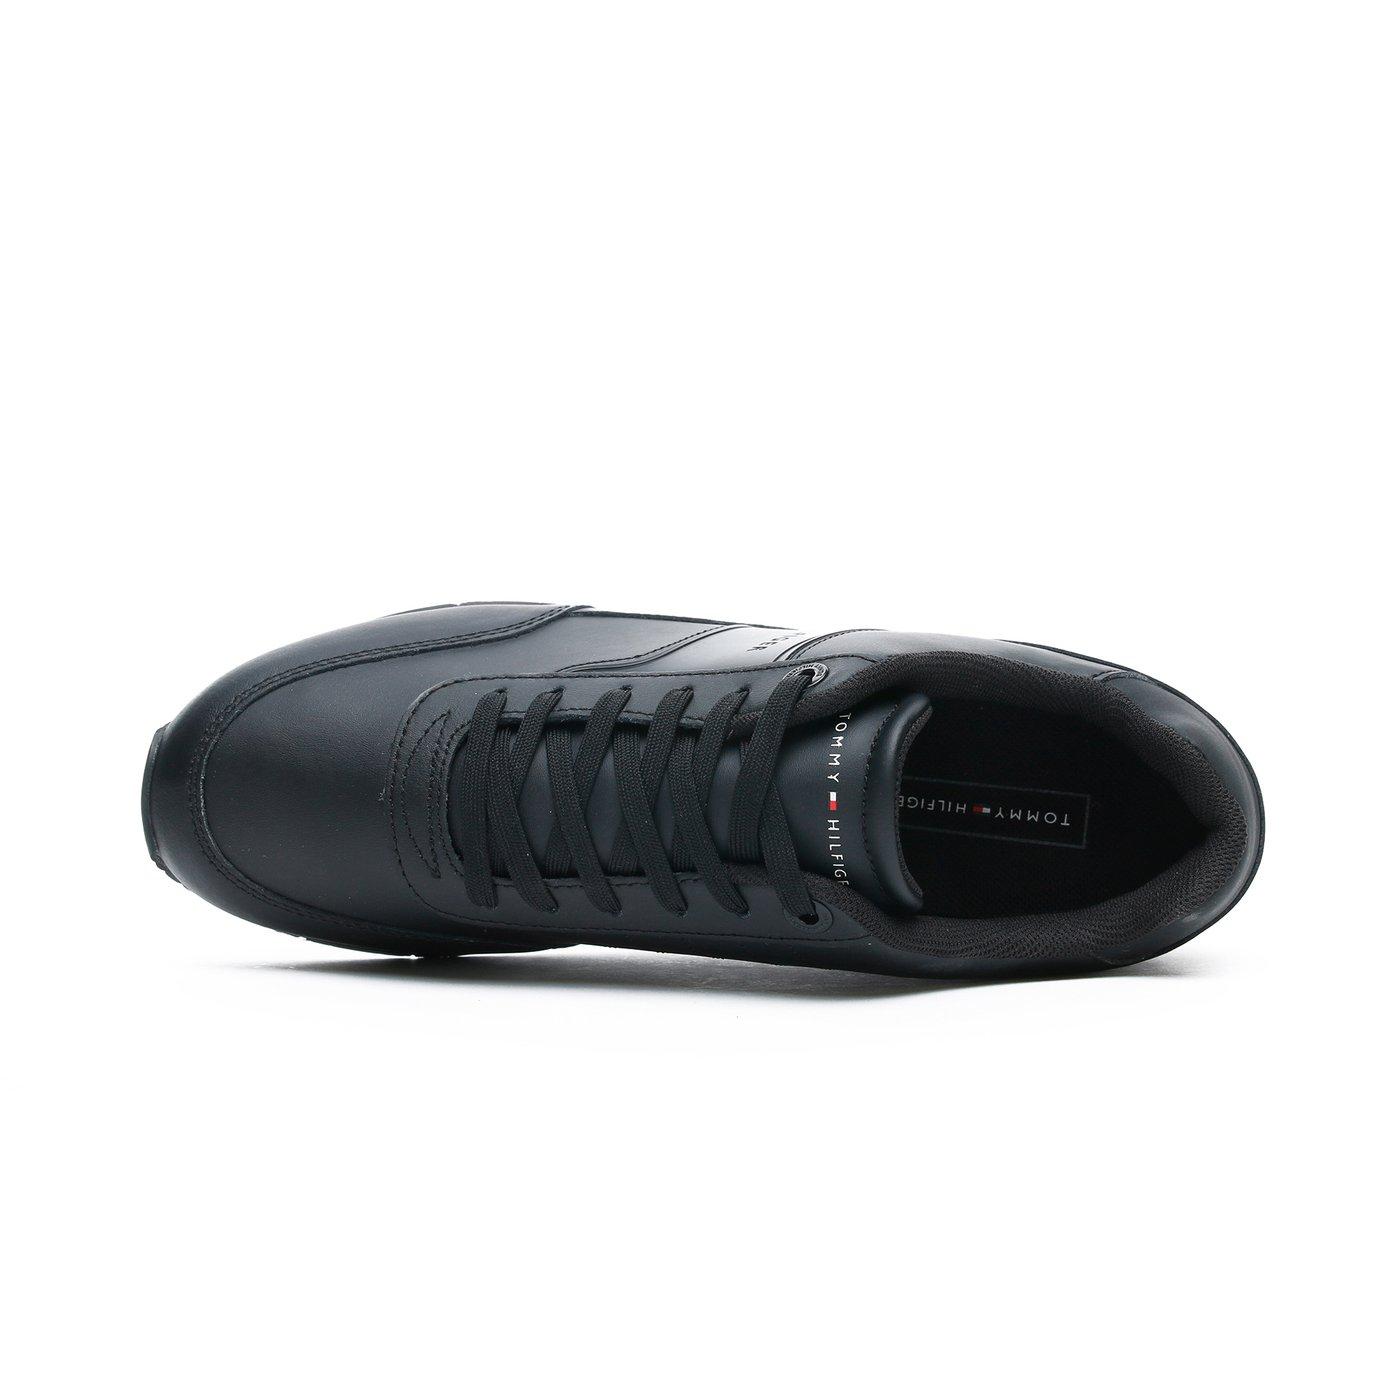 Tommy Hilfiger Corporate Erkek Siyah Spor Ayakkabı